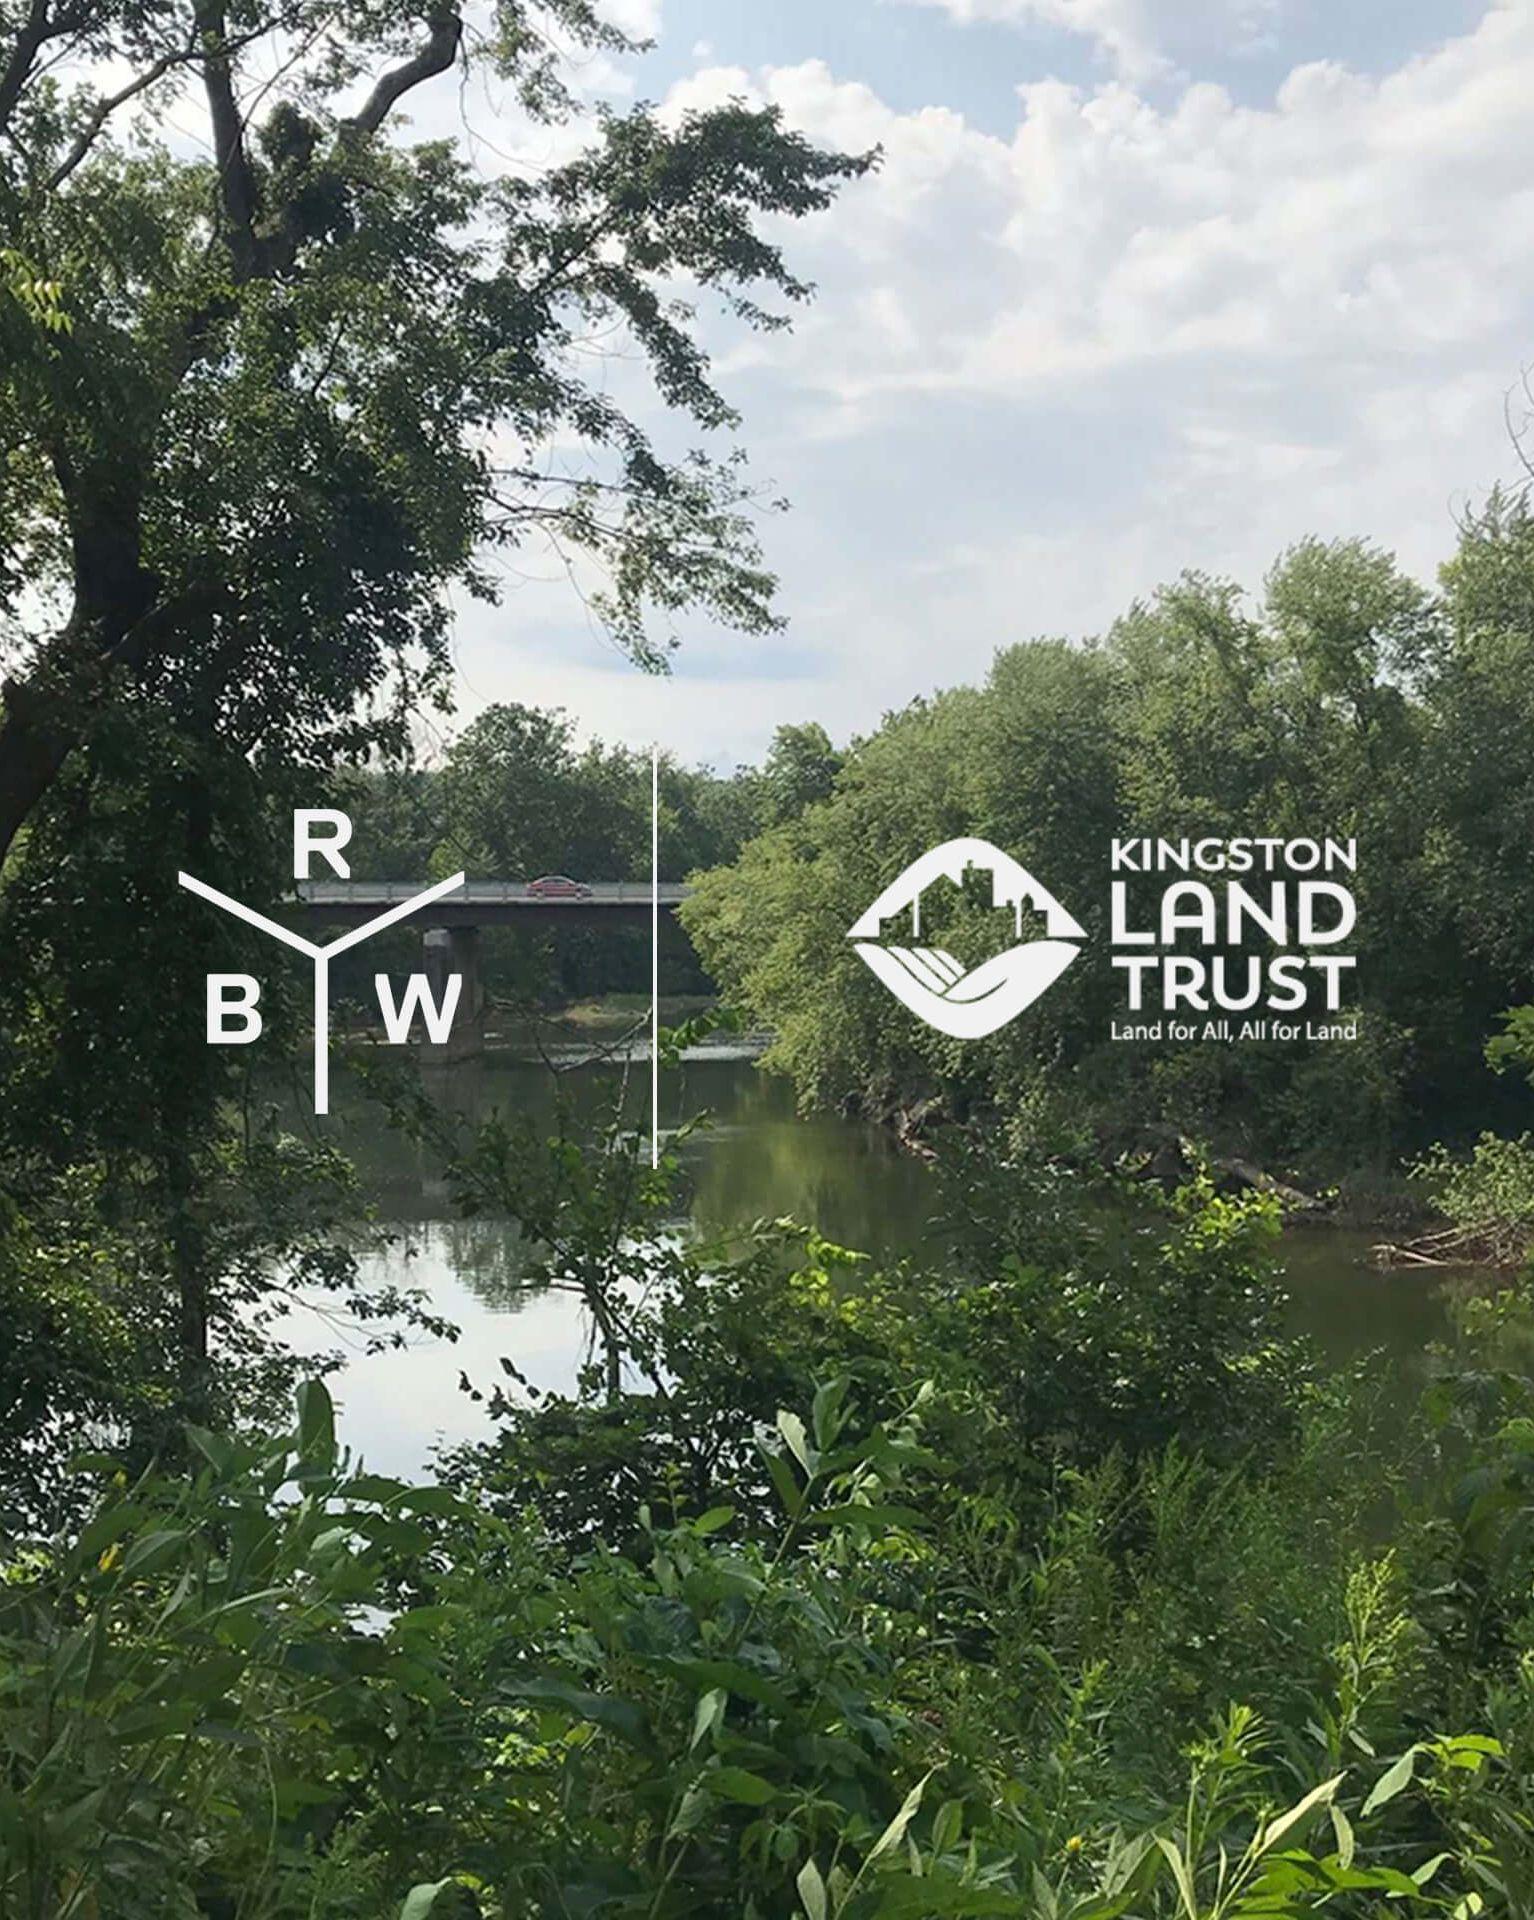 Partner with Kingston Land Trust